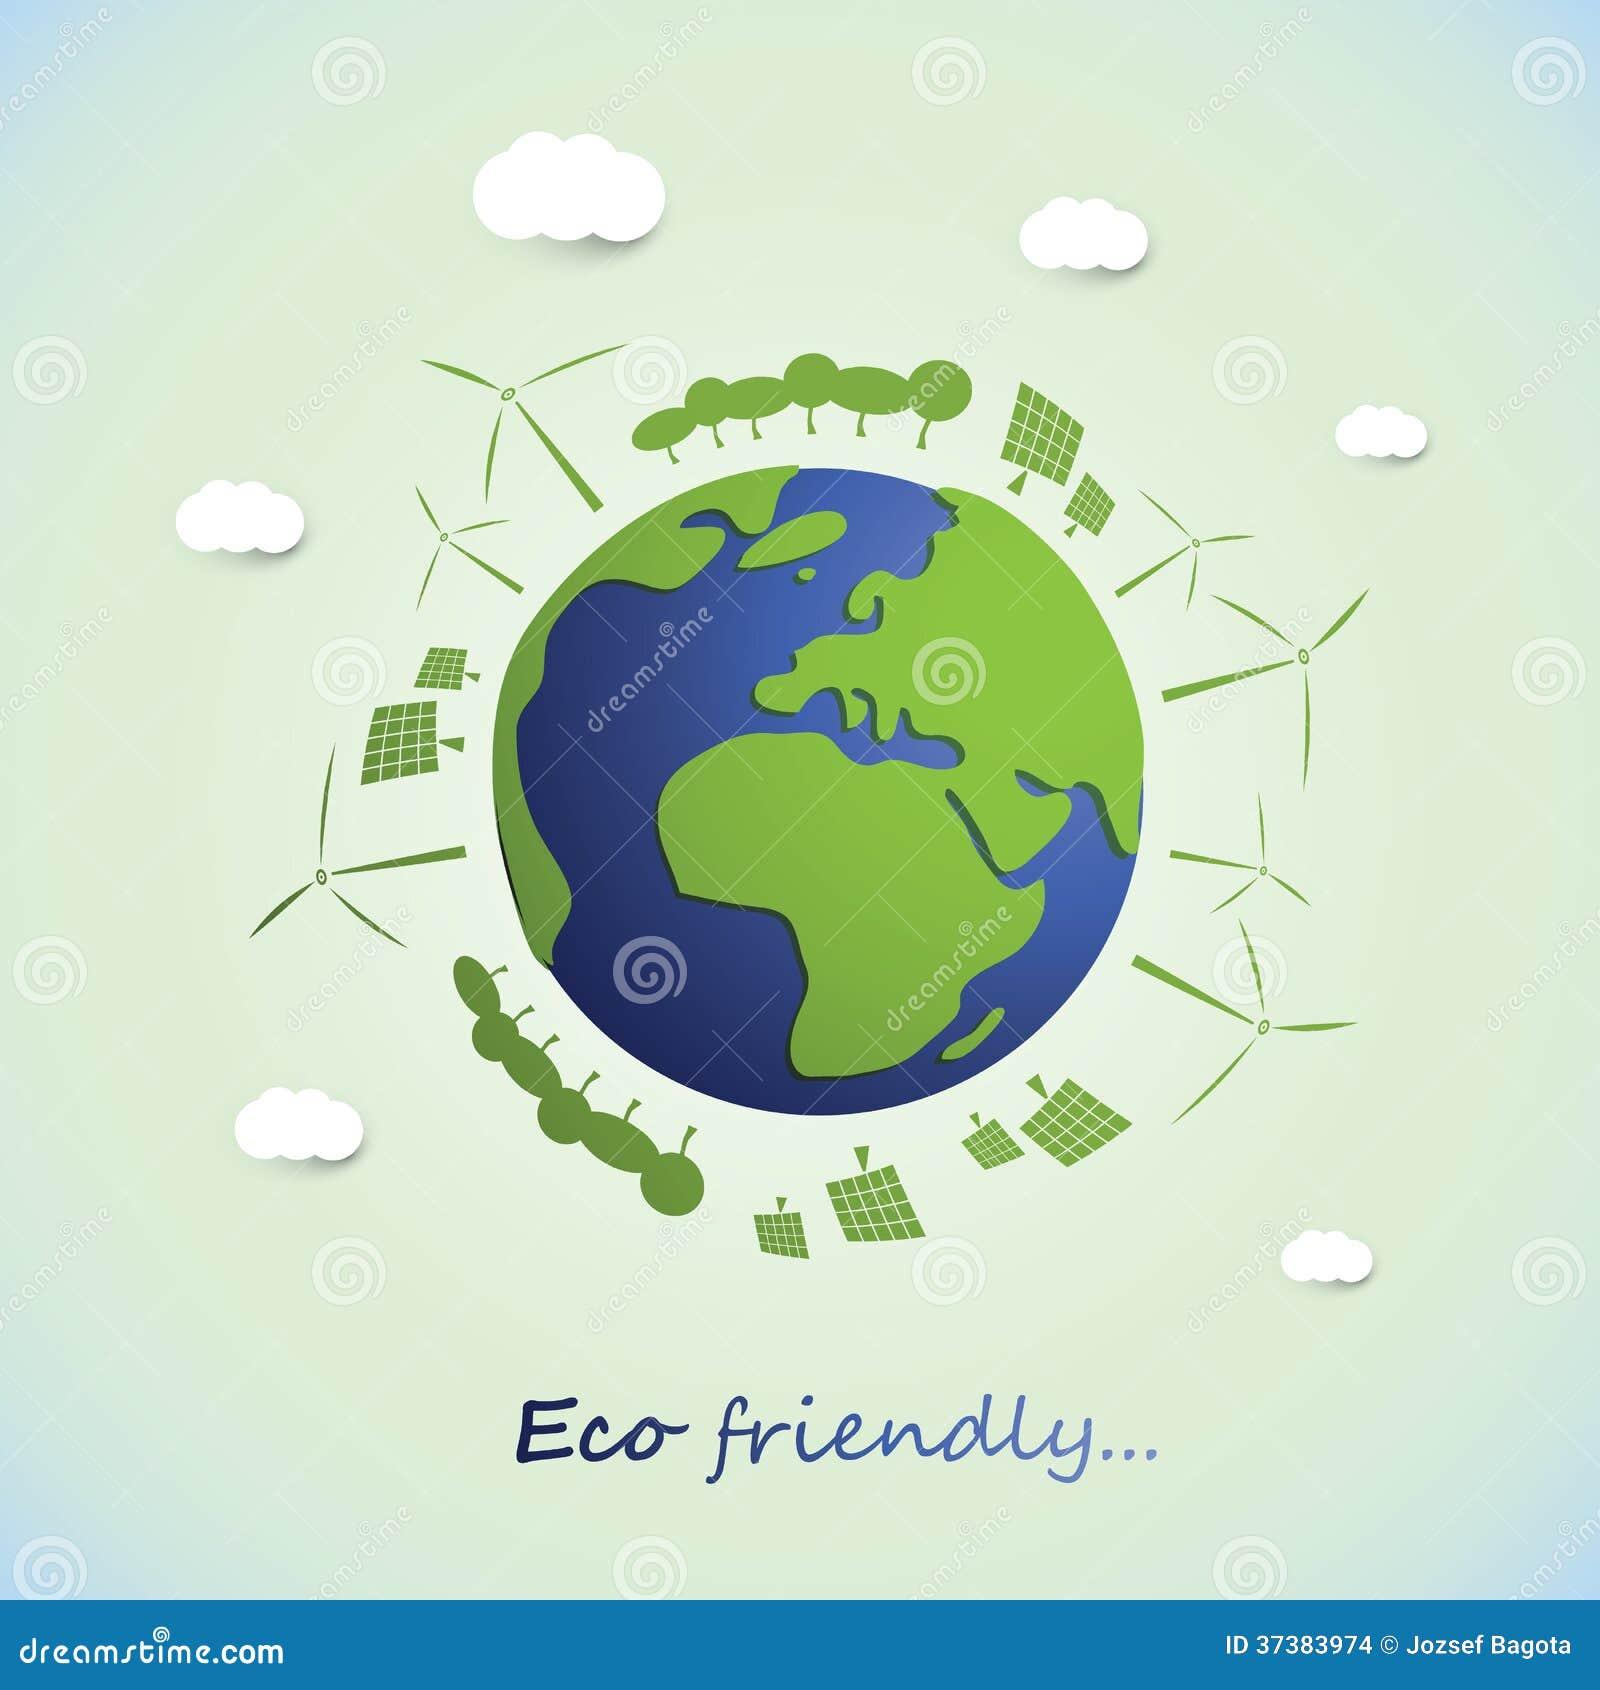 Environmental Concept Earthfriendly Landscapes: Environmentally Friendly Planet Stock